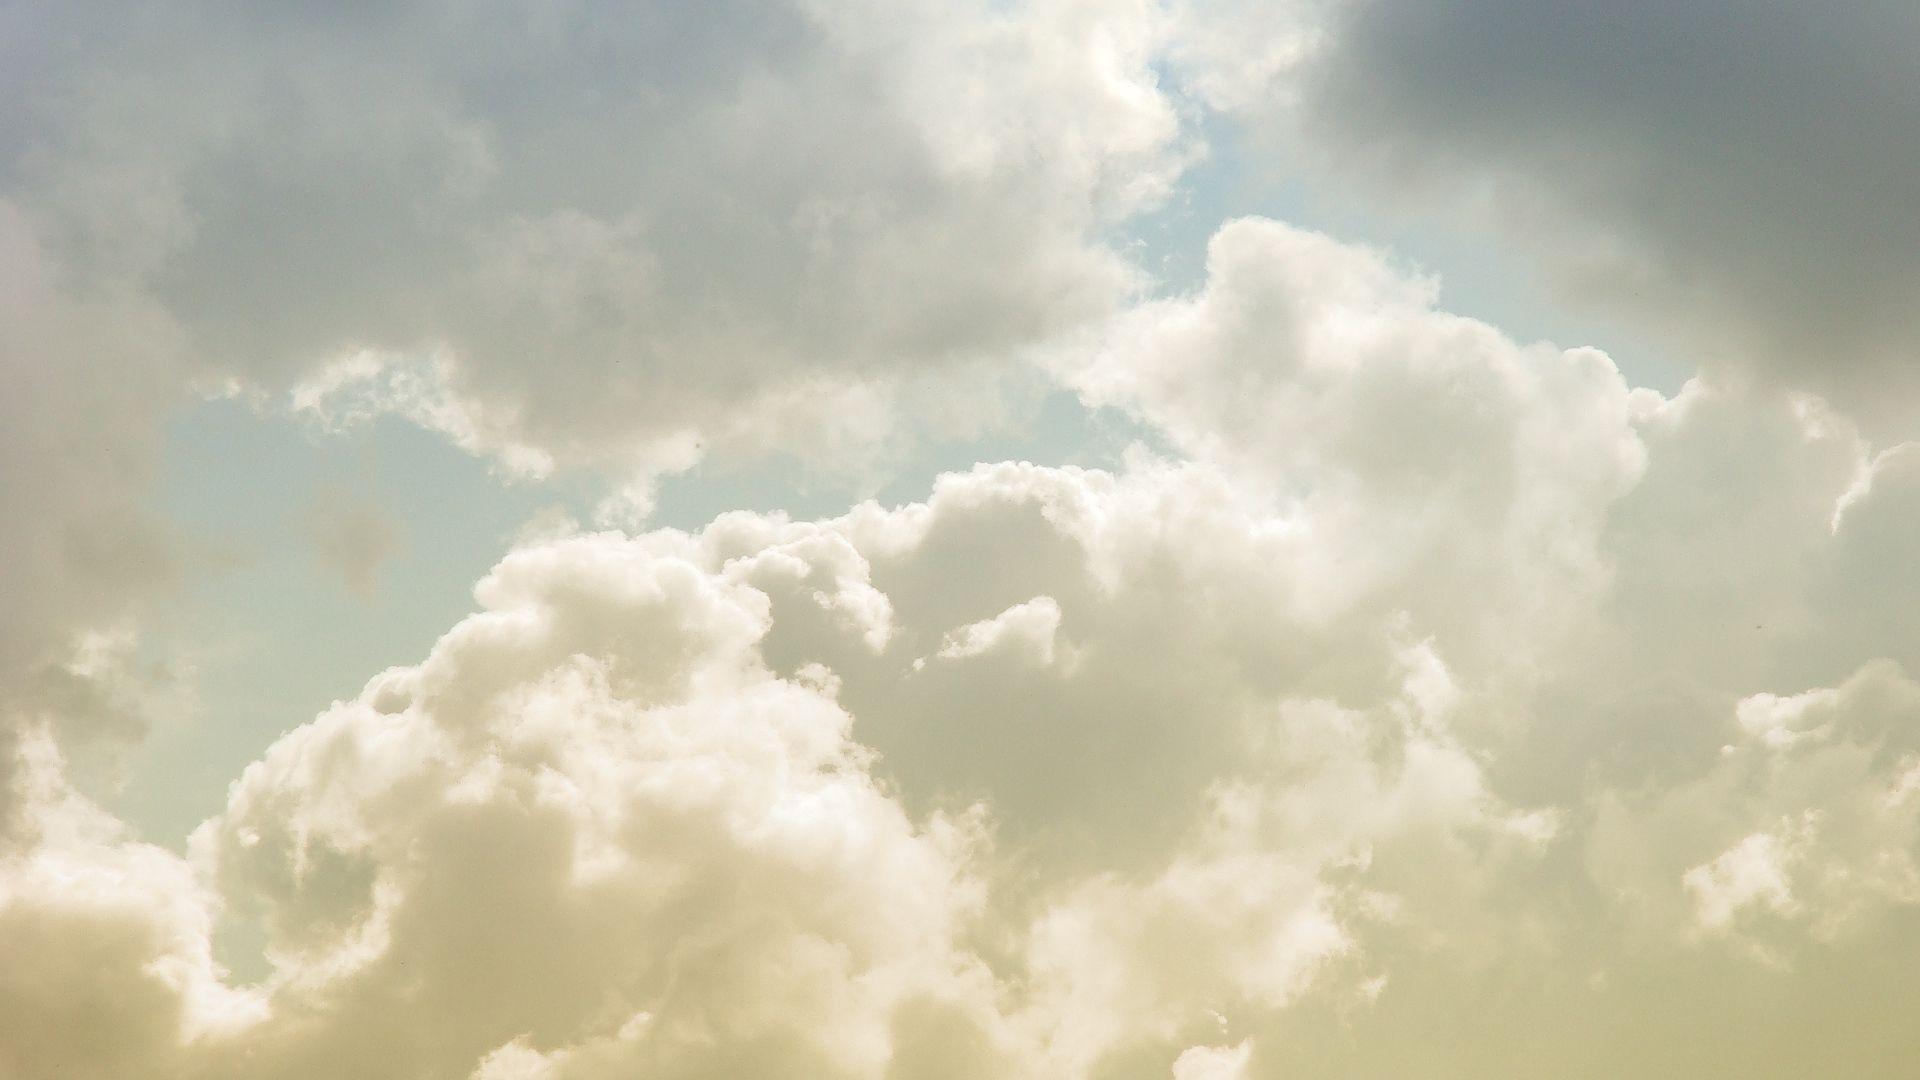 Cloud Wallpapers HD 1920x1080